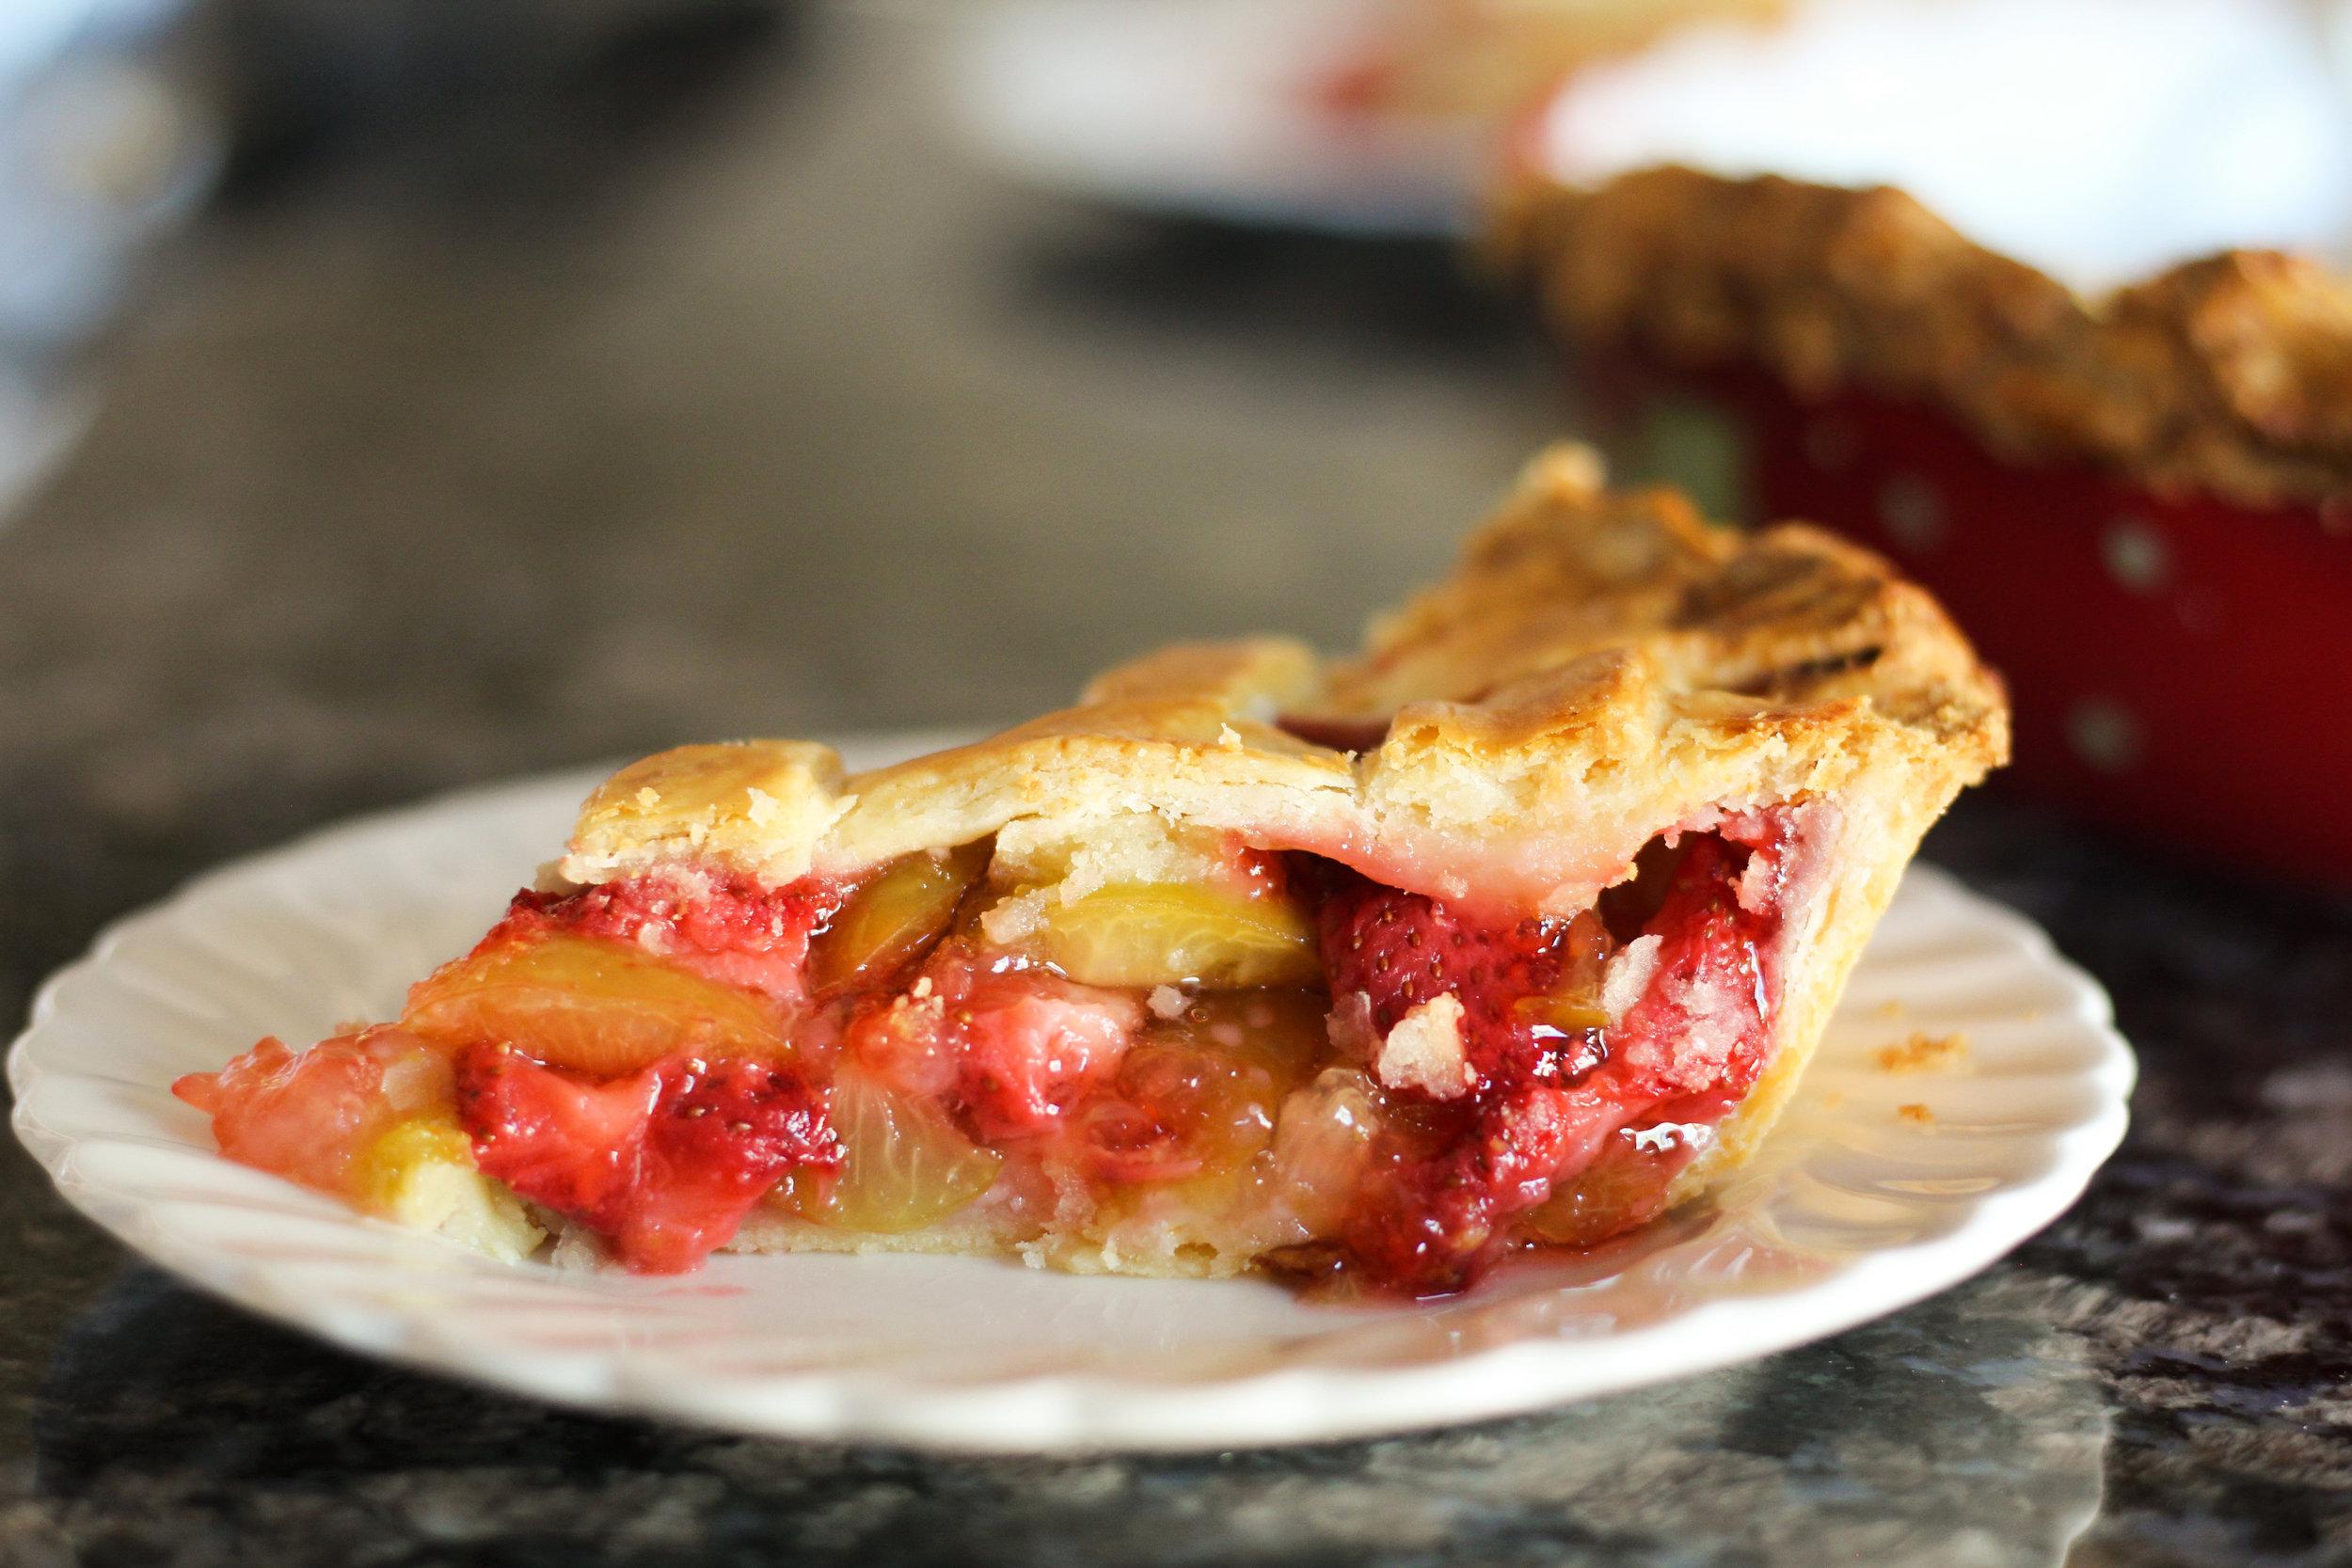 strawberry sour plum pie (strawberry jarareng pie)